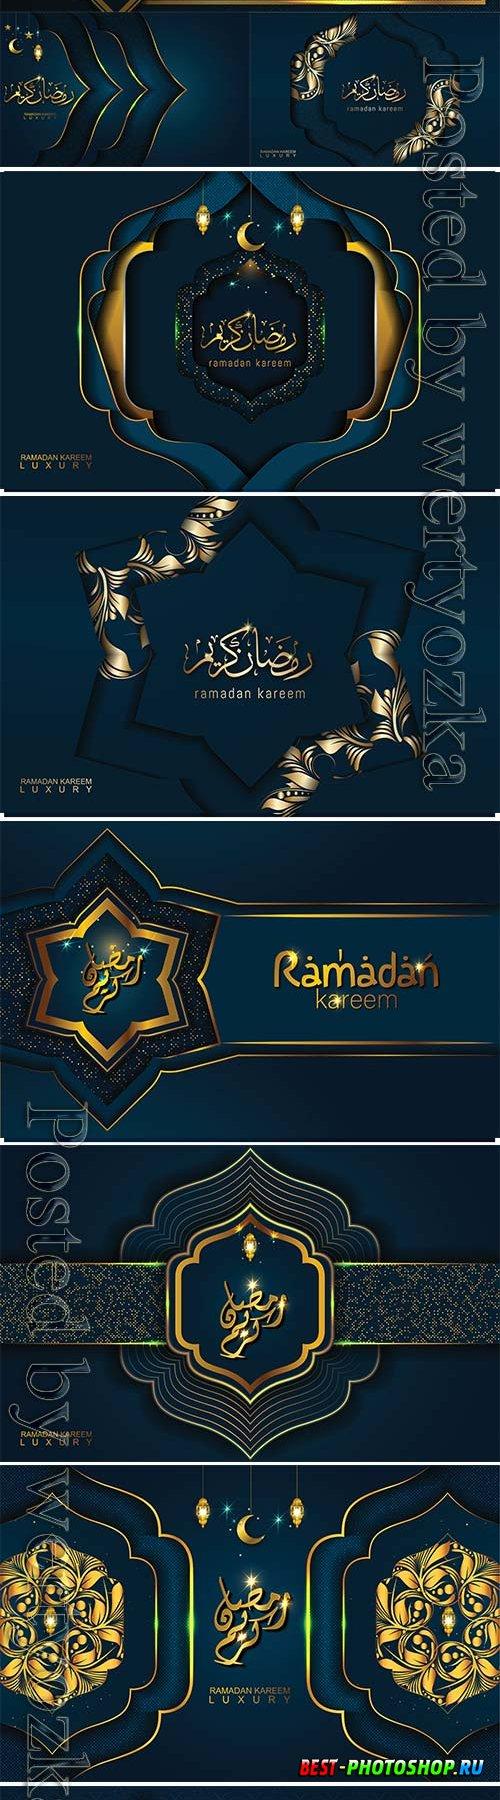 Ramadan Kareem in luxury style with arabic calligraphy